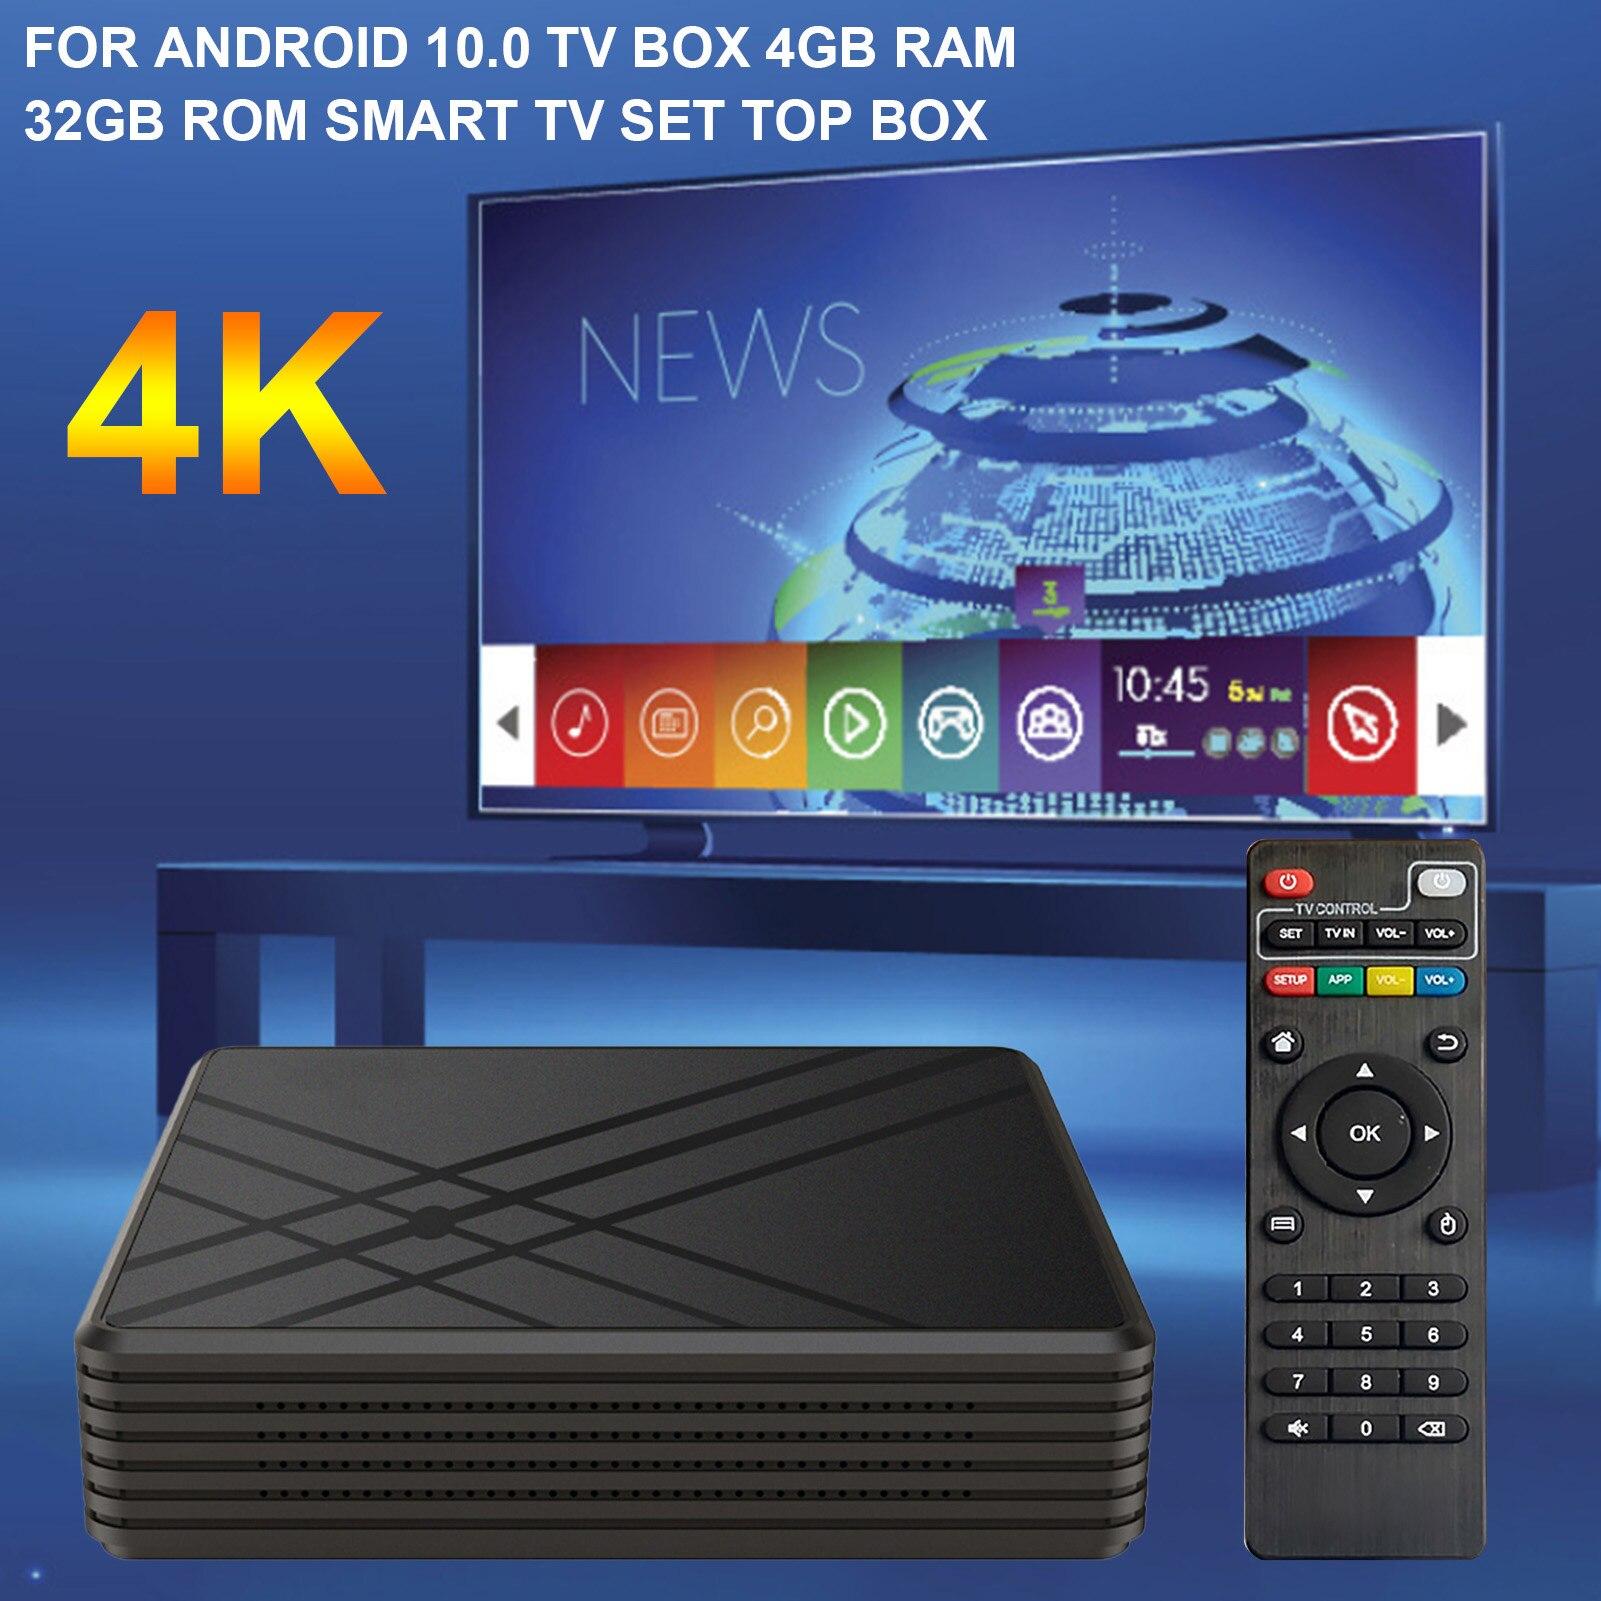 m8s max tv box octa core amlogic s912 3gb ram 32gb rom 4k uhd smart tv box android 7 1 with dual wifi ota update 1year iptv Android 9.0 Smart TV Box Android 9 MAX 4GB RAM 32GB ROM RK3318 BT4.0 TVBOX 5.8G Dual Wifi Media Player Youtube 4K Set Top Box